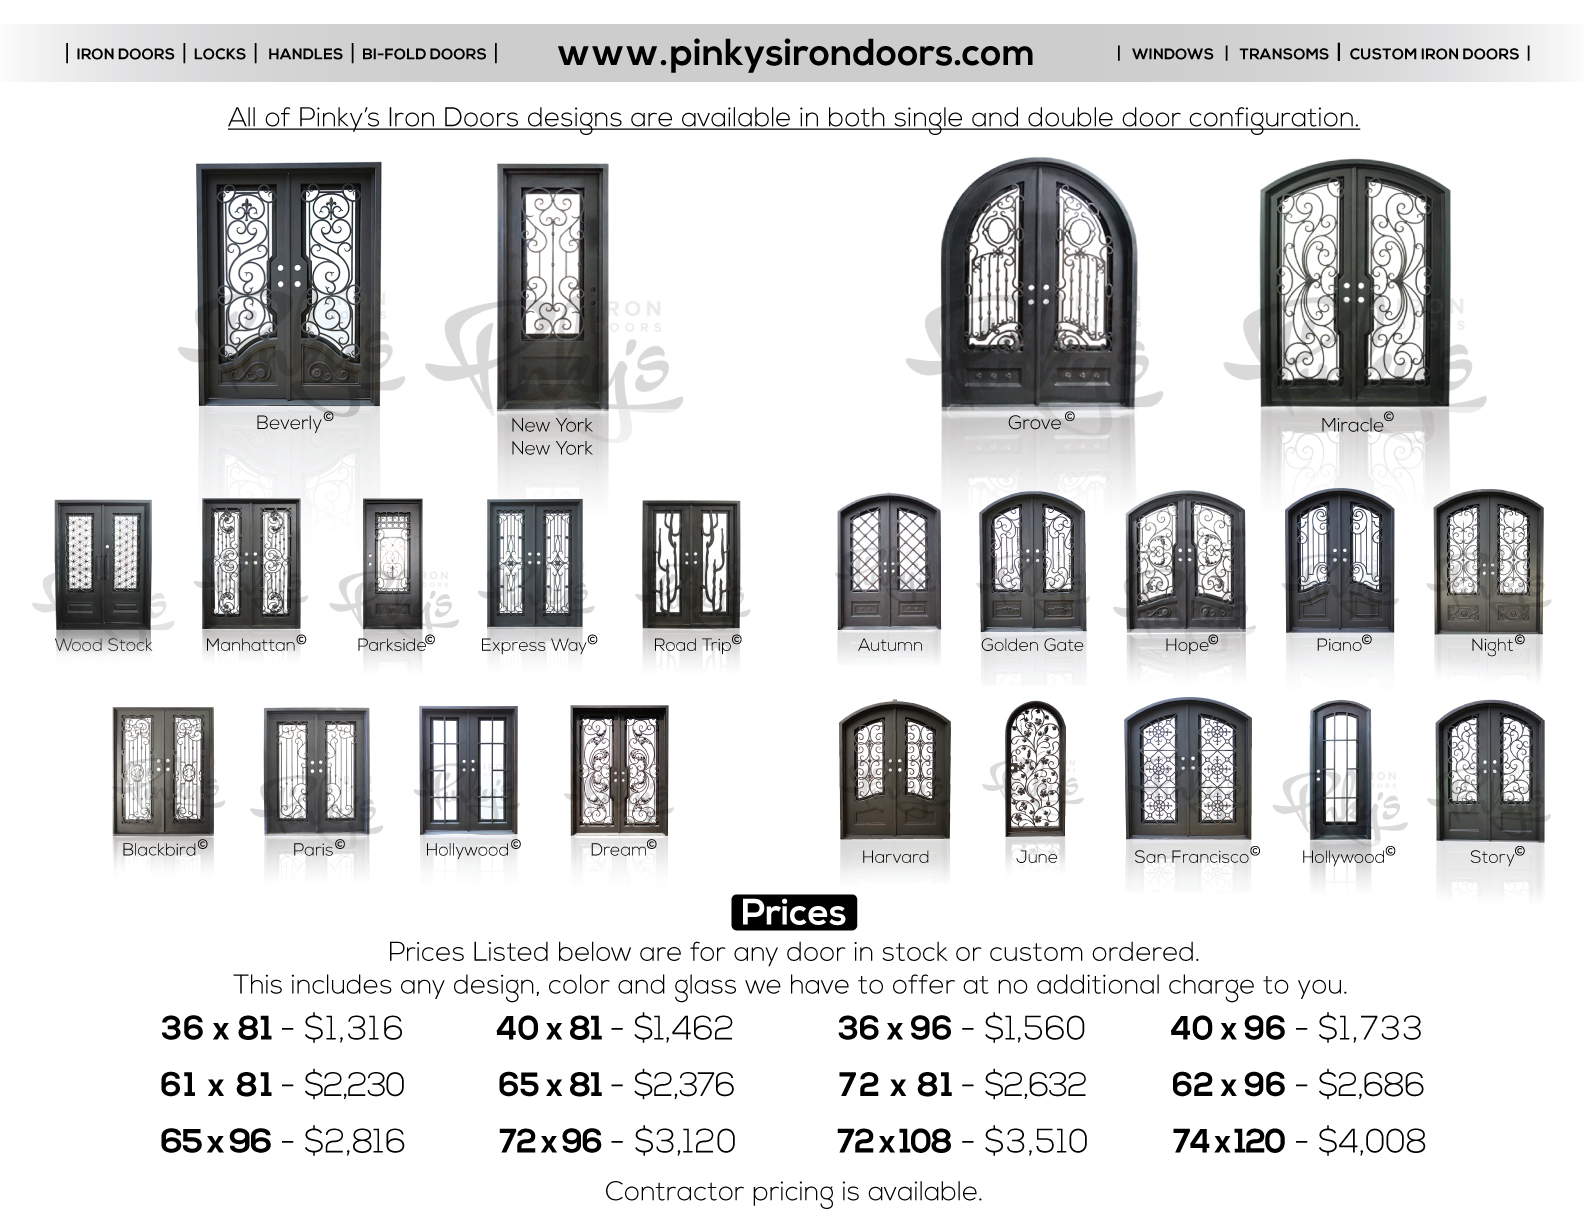 Pinky's Iron Doors image 23